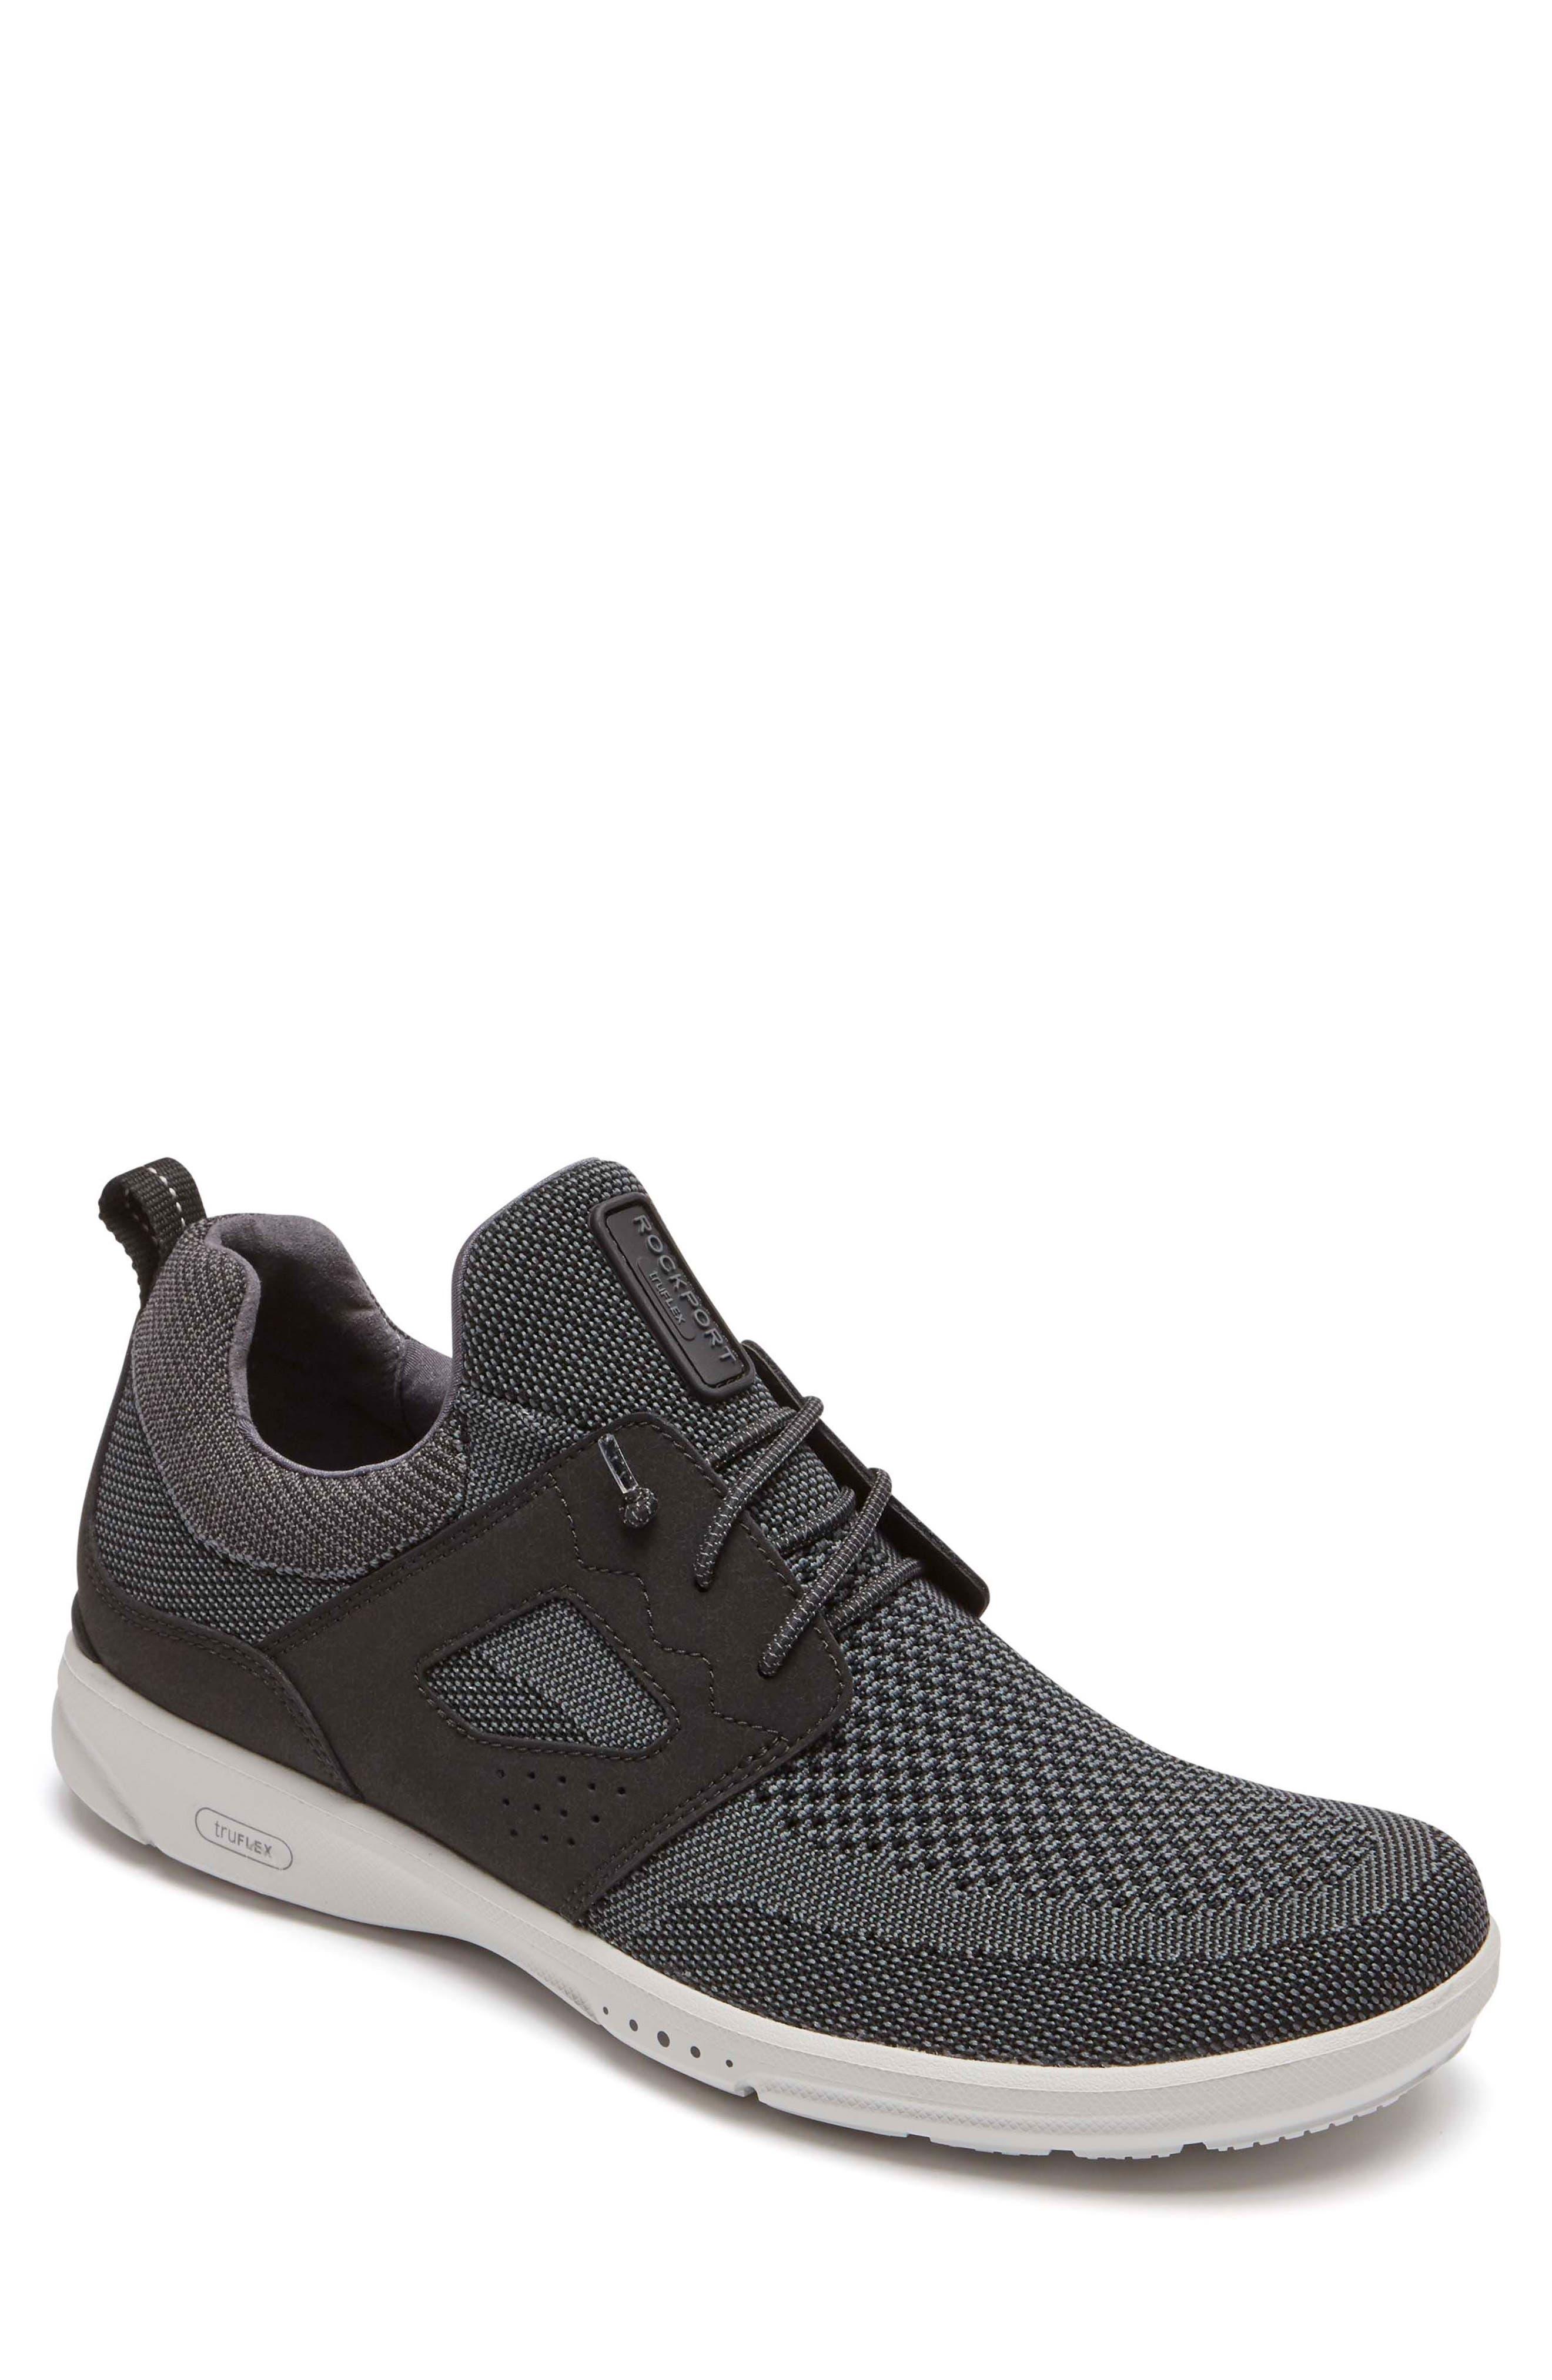 Alternate Image 1 Selected - Rockport truFlex Sneaker (Men)